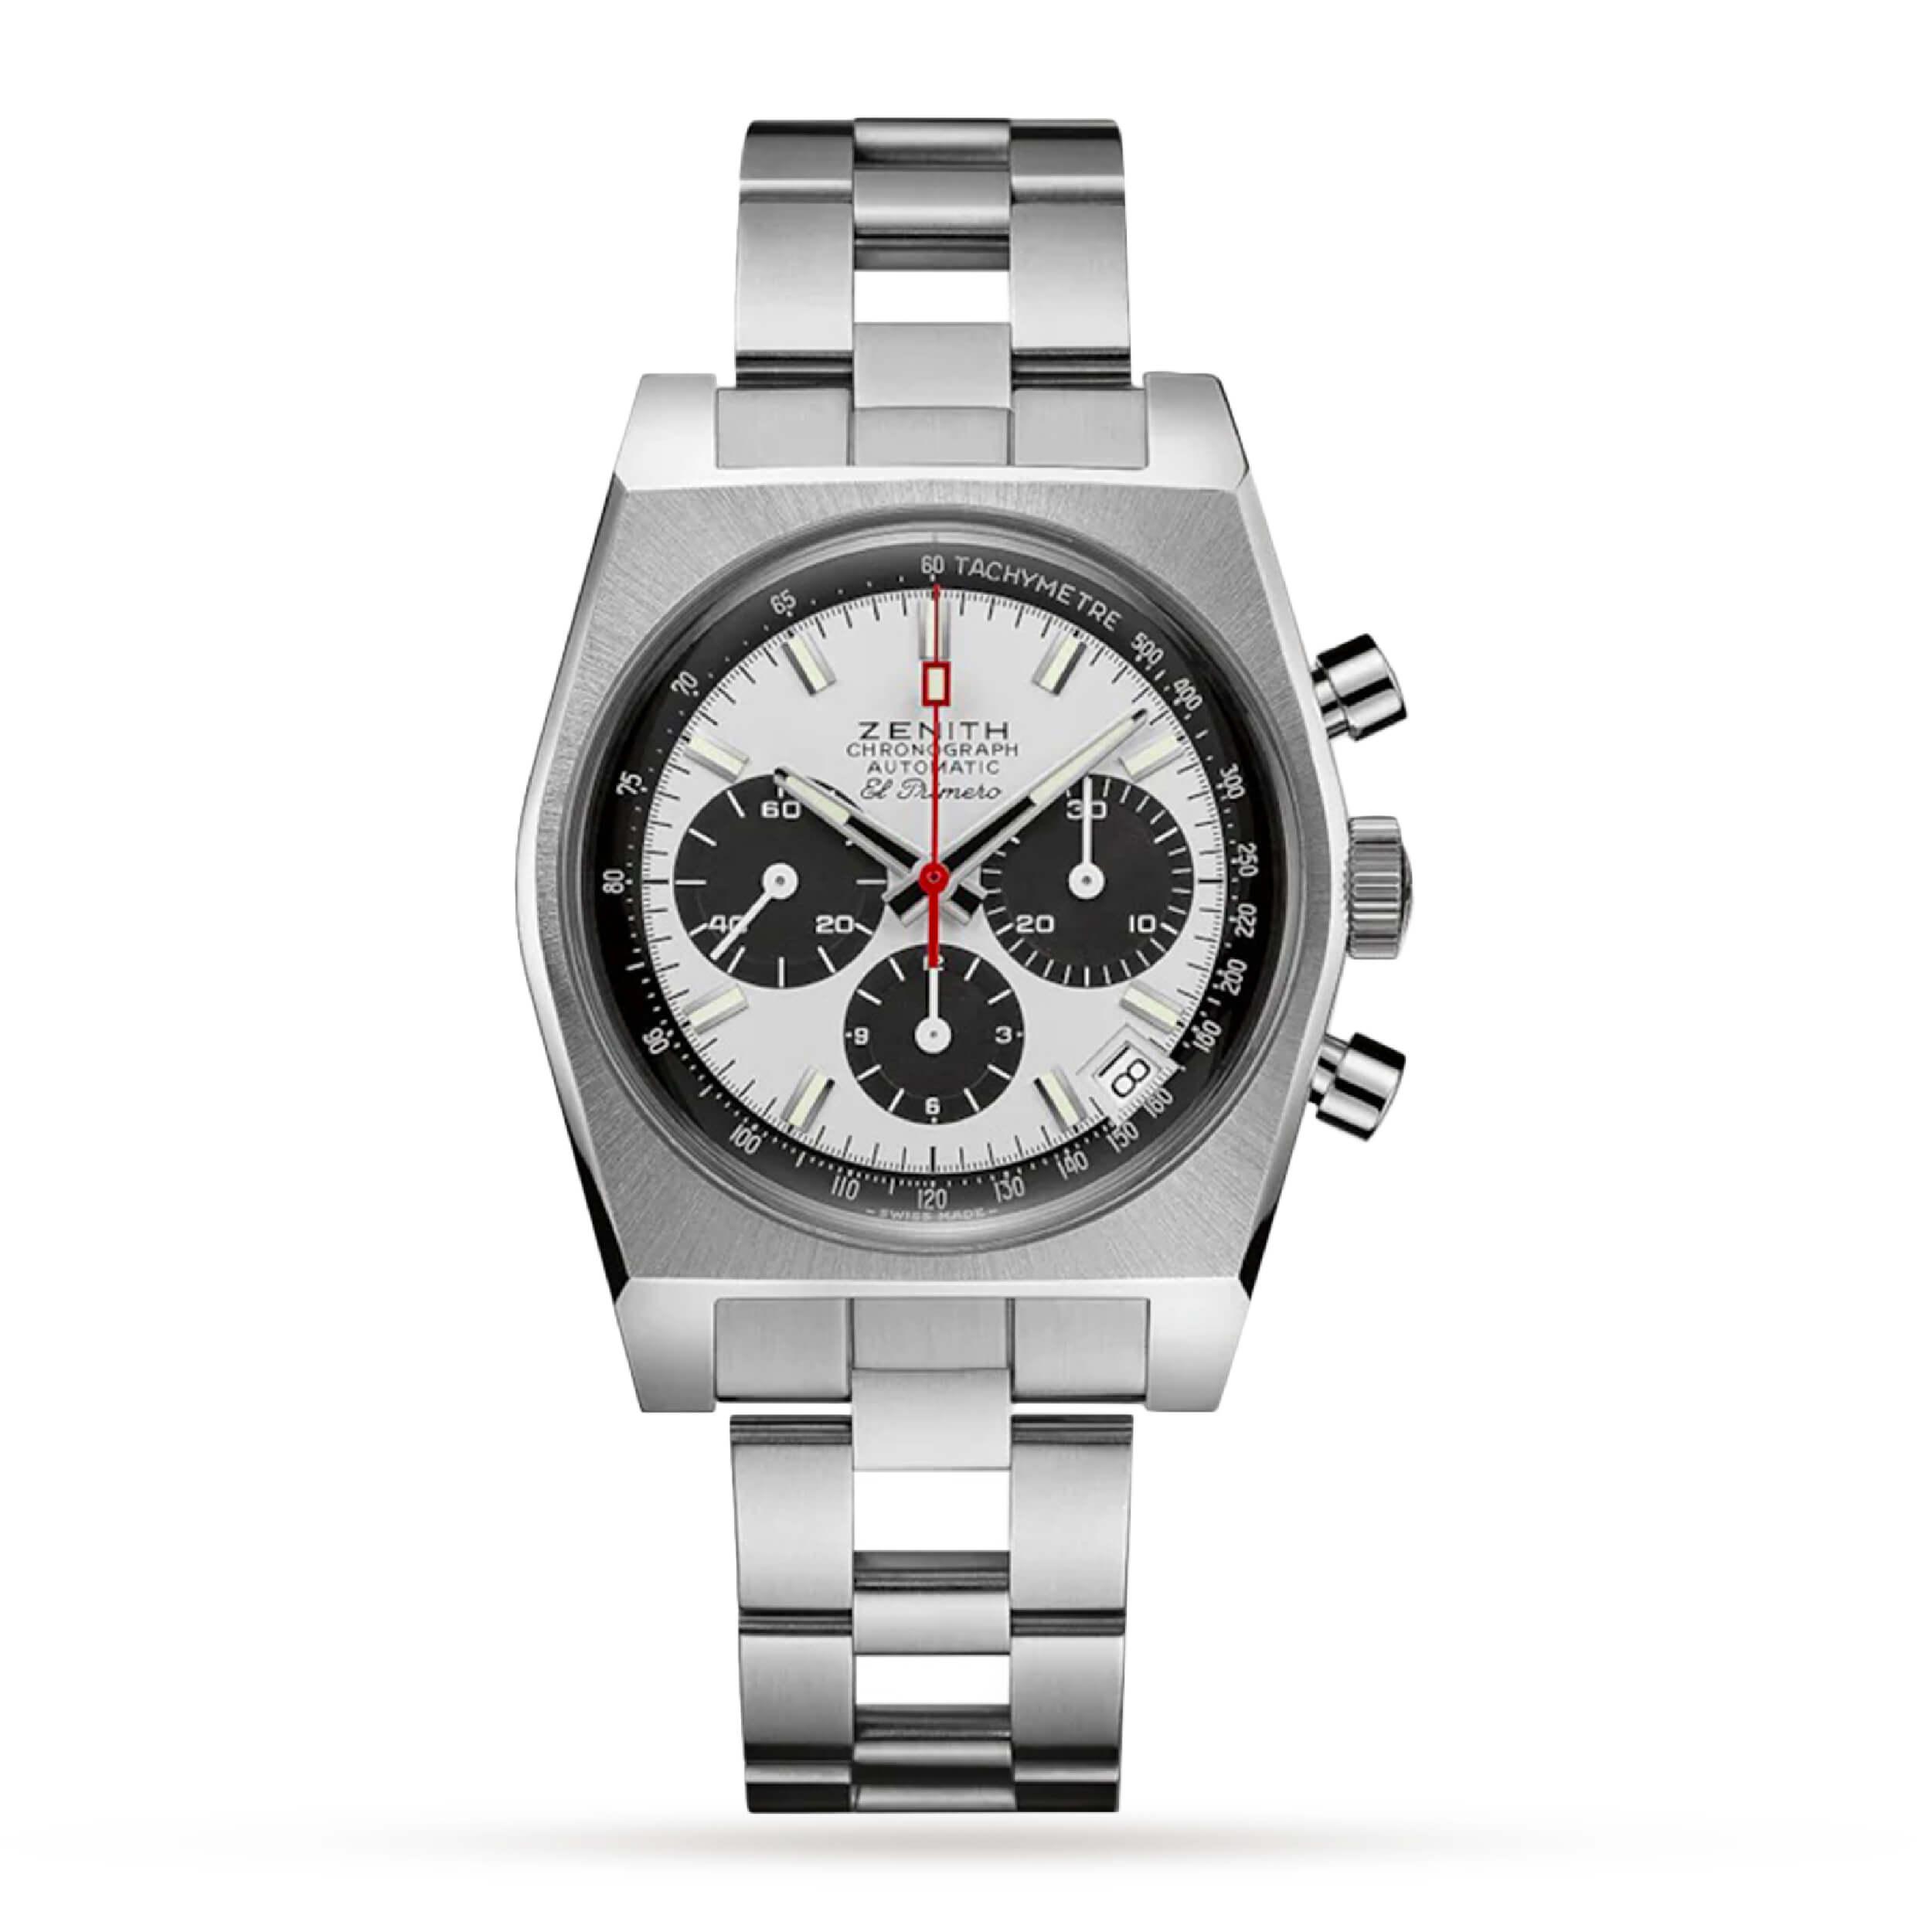 Zenith Chronomaster Revival El Primero | Best Luxury Chronograph Watches 2021